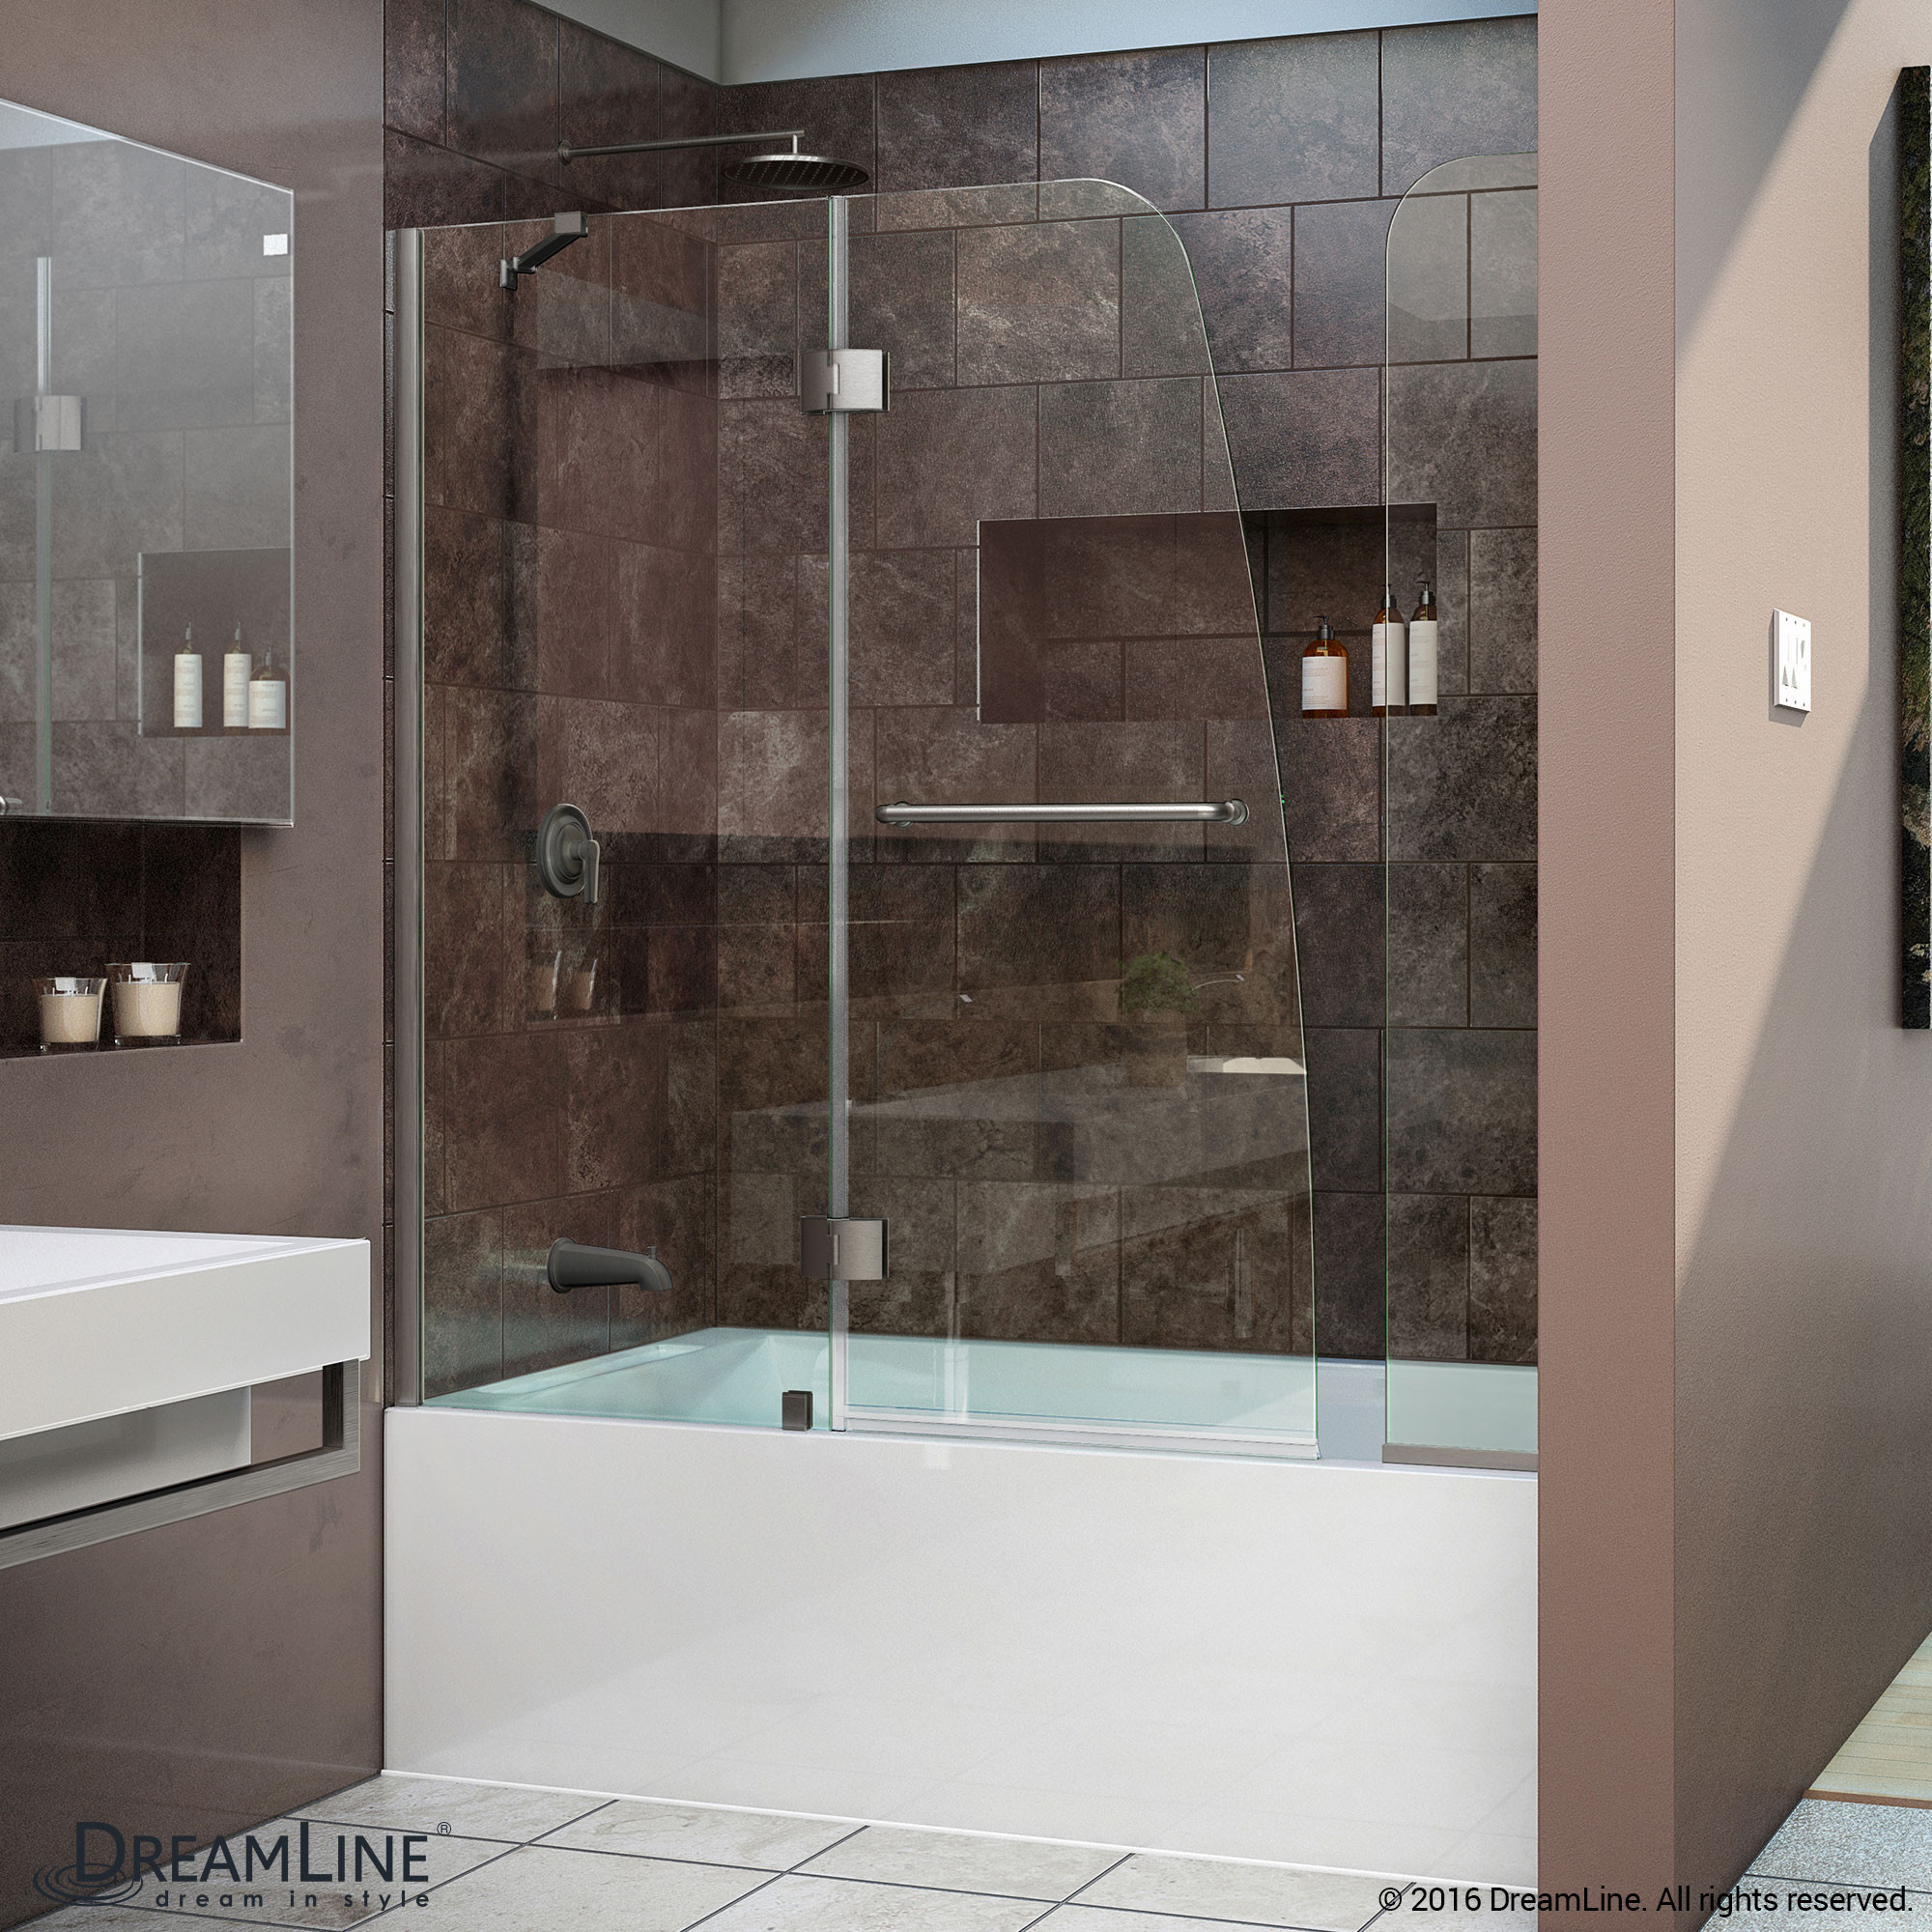 DreamLine SHDR-3148586-EX-04 Brushed Nickel Aqua 56 to 60 x 58 Inch Hinged Tub Door